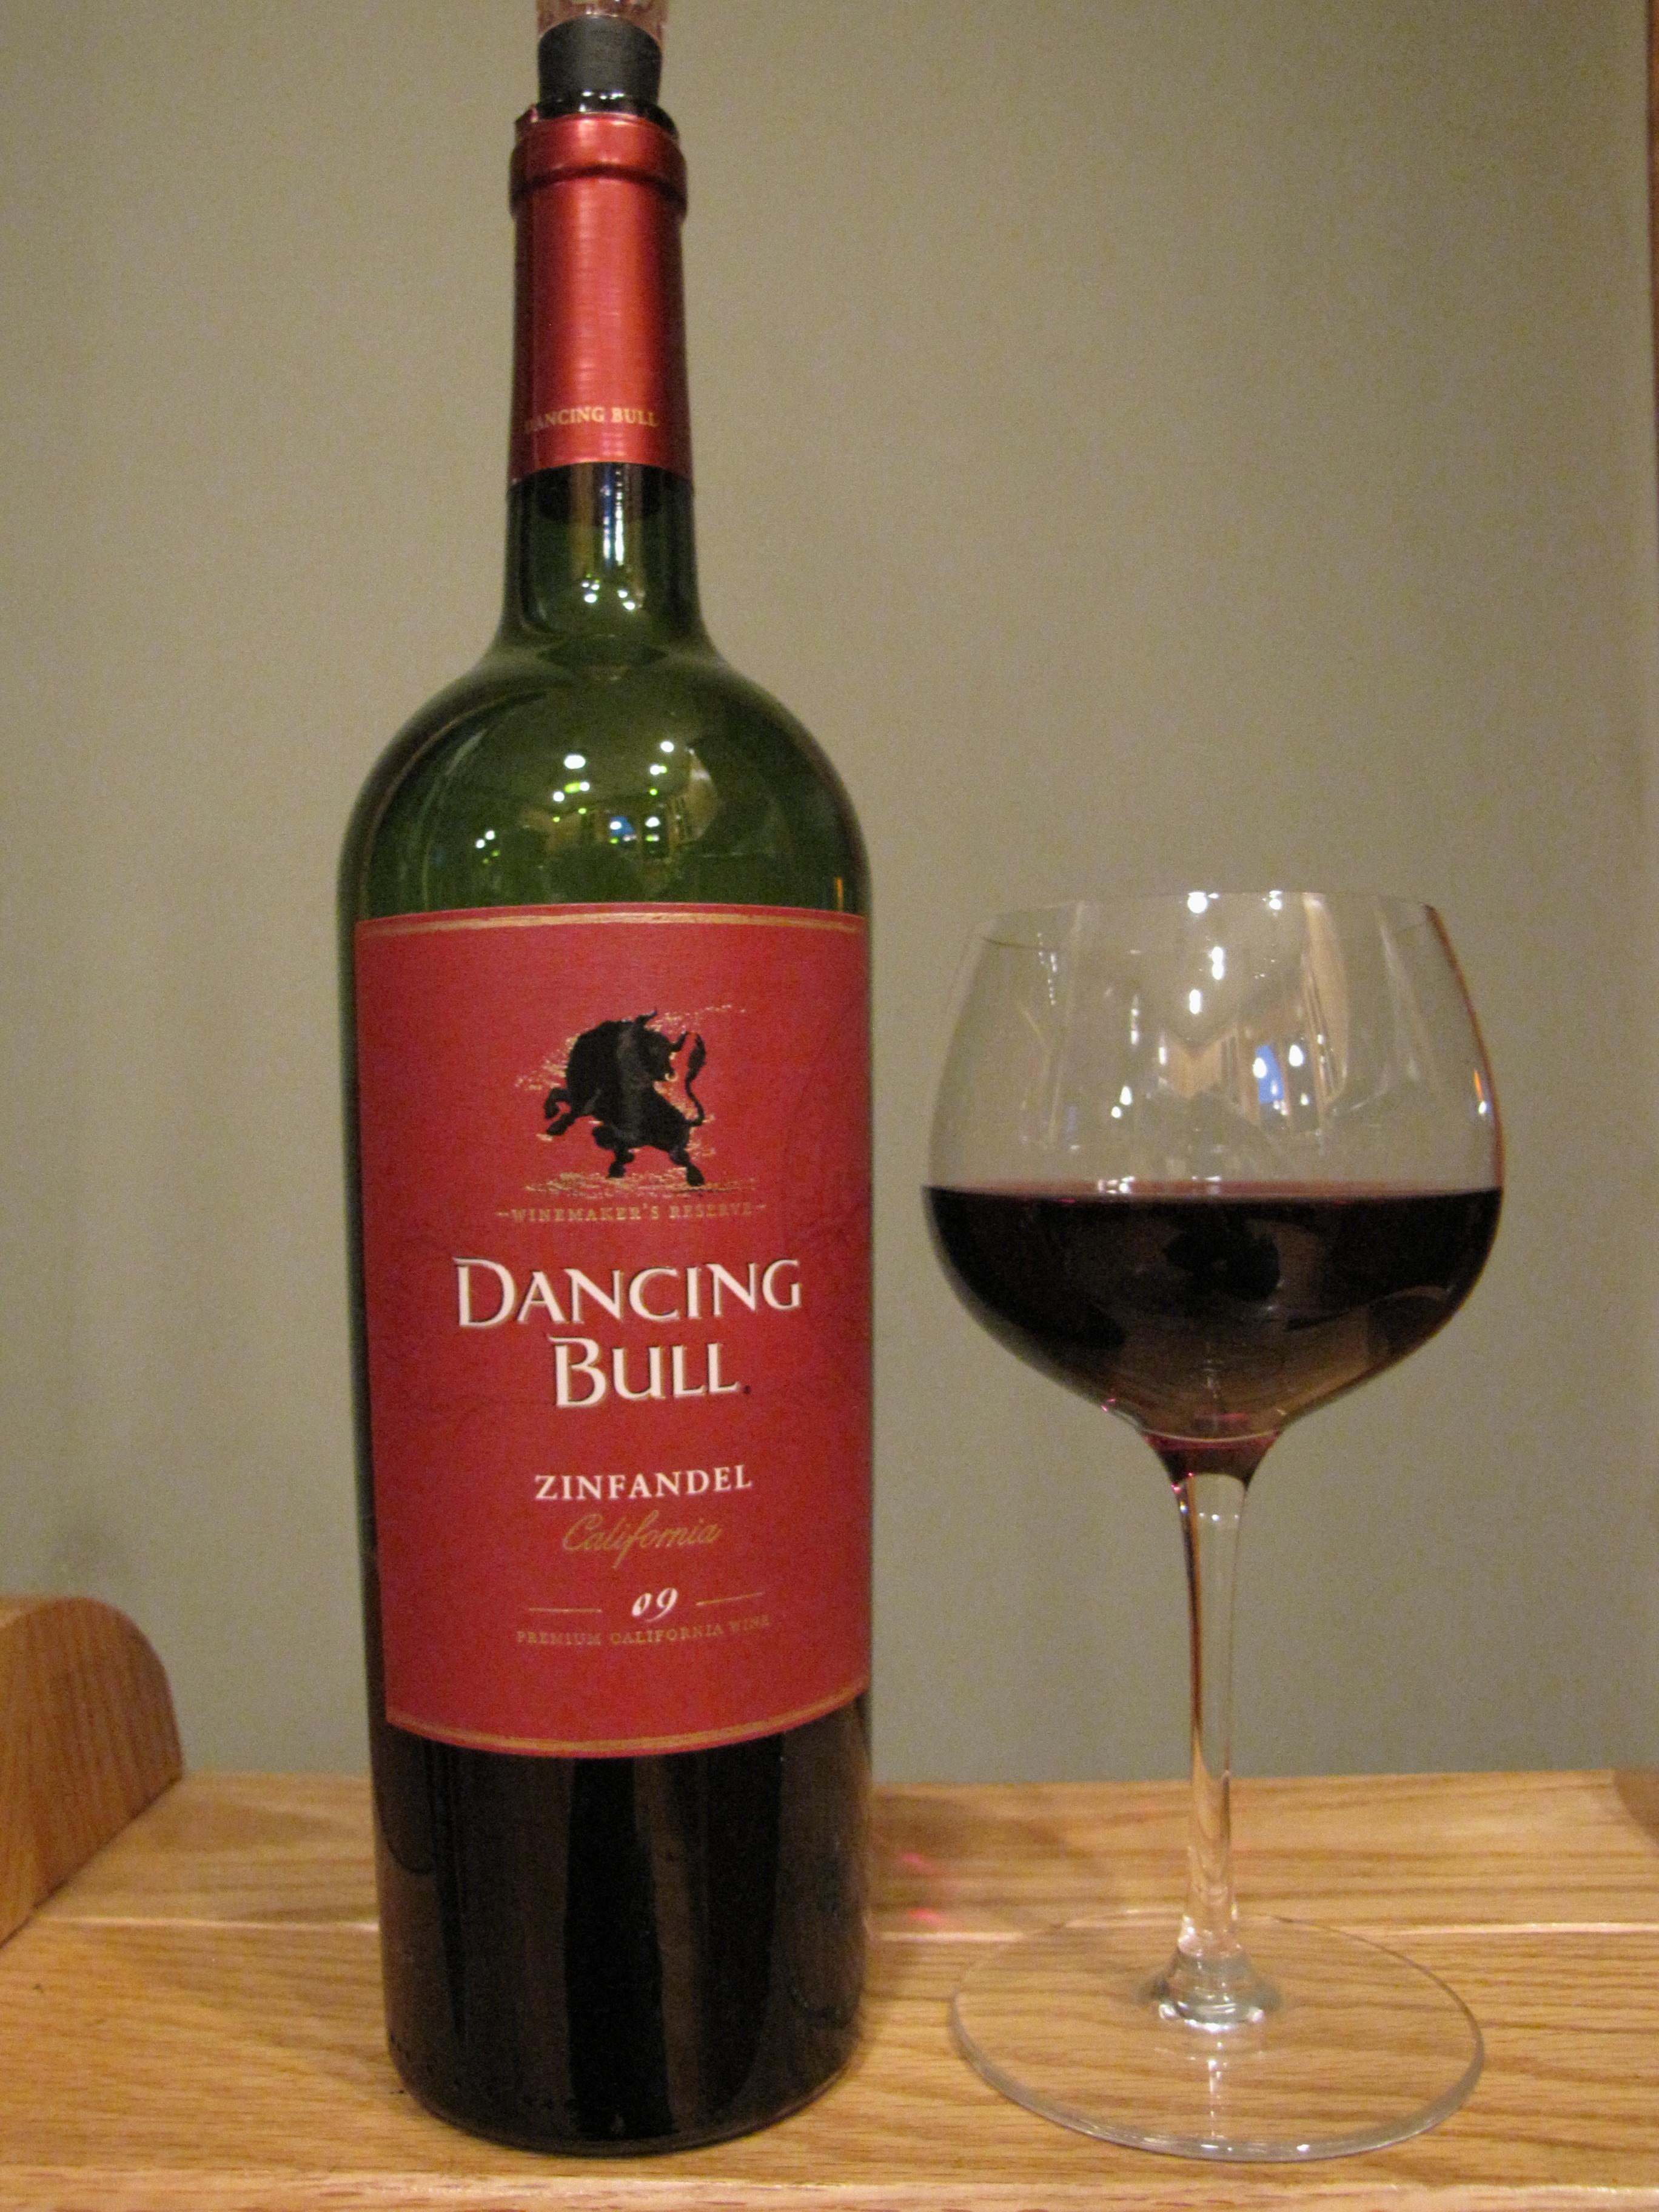 Dancing Bull Zinfandel (2009)